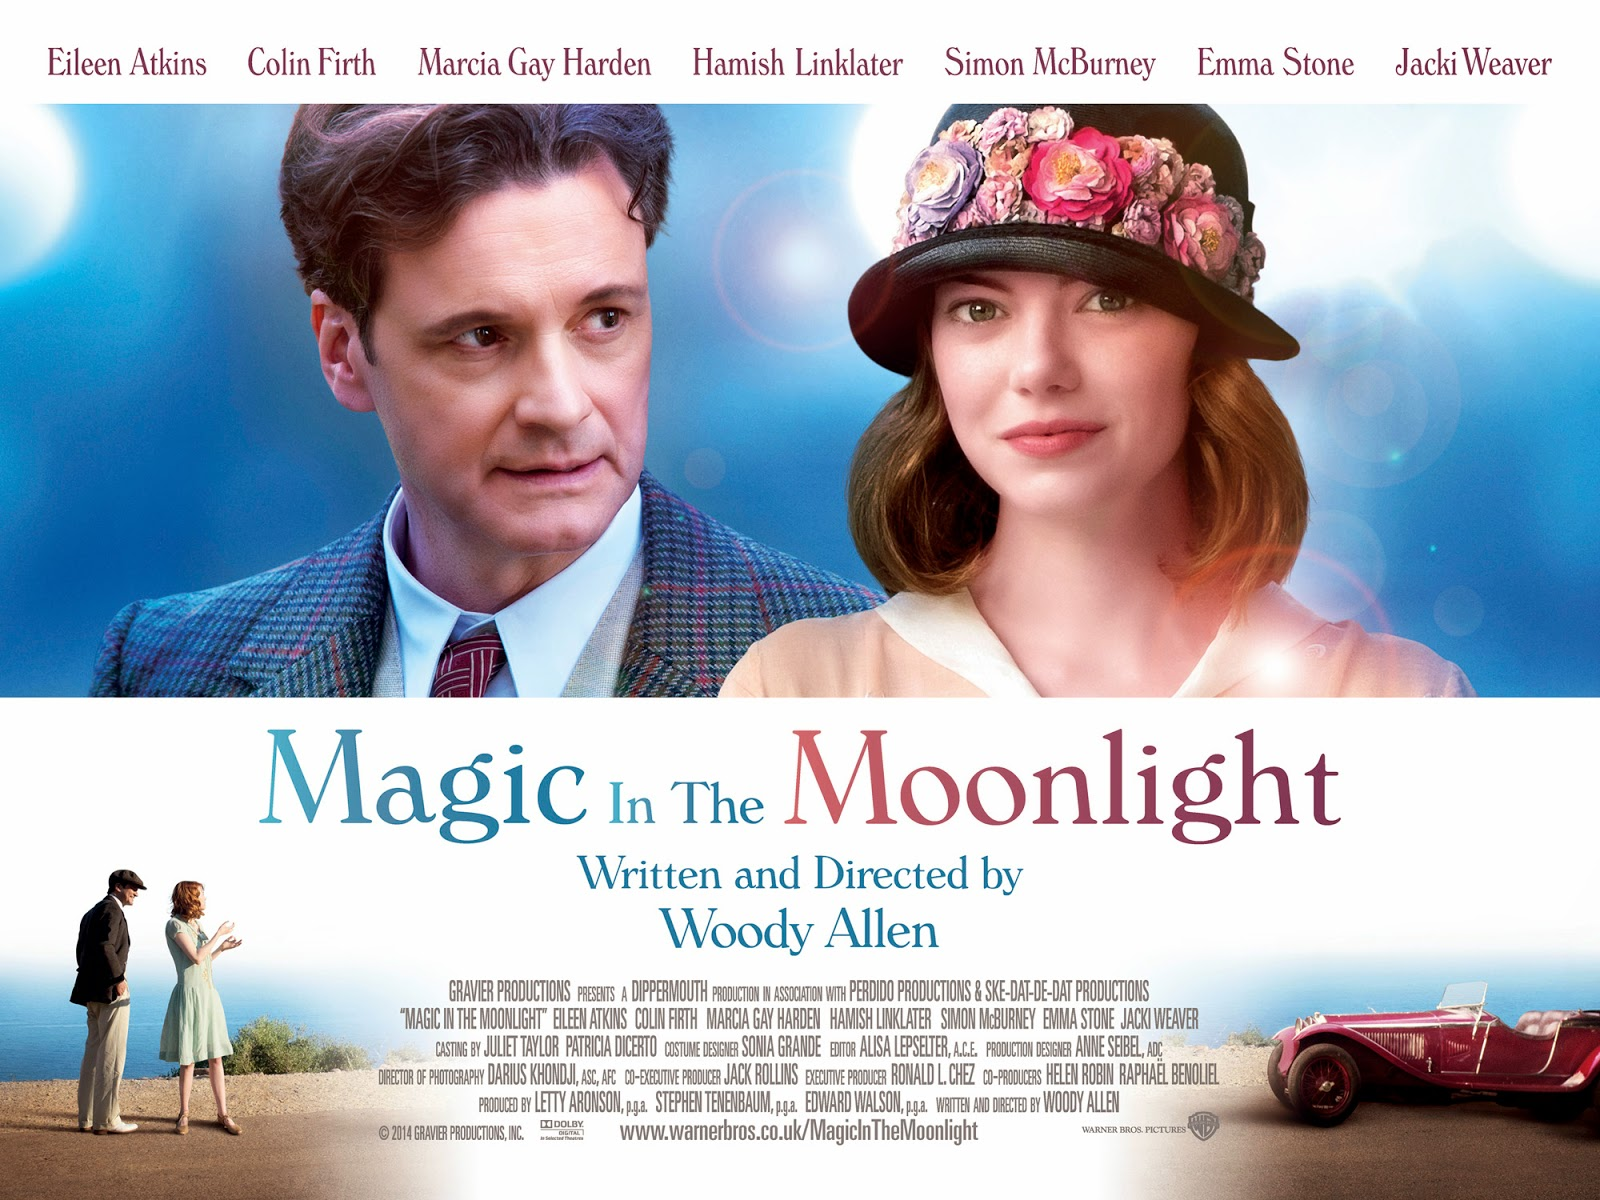 MAGIC IN THE MOONLIGHT: Provaci ancora, Woody